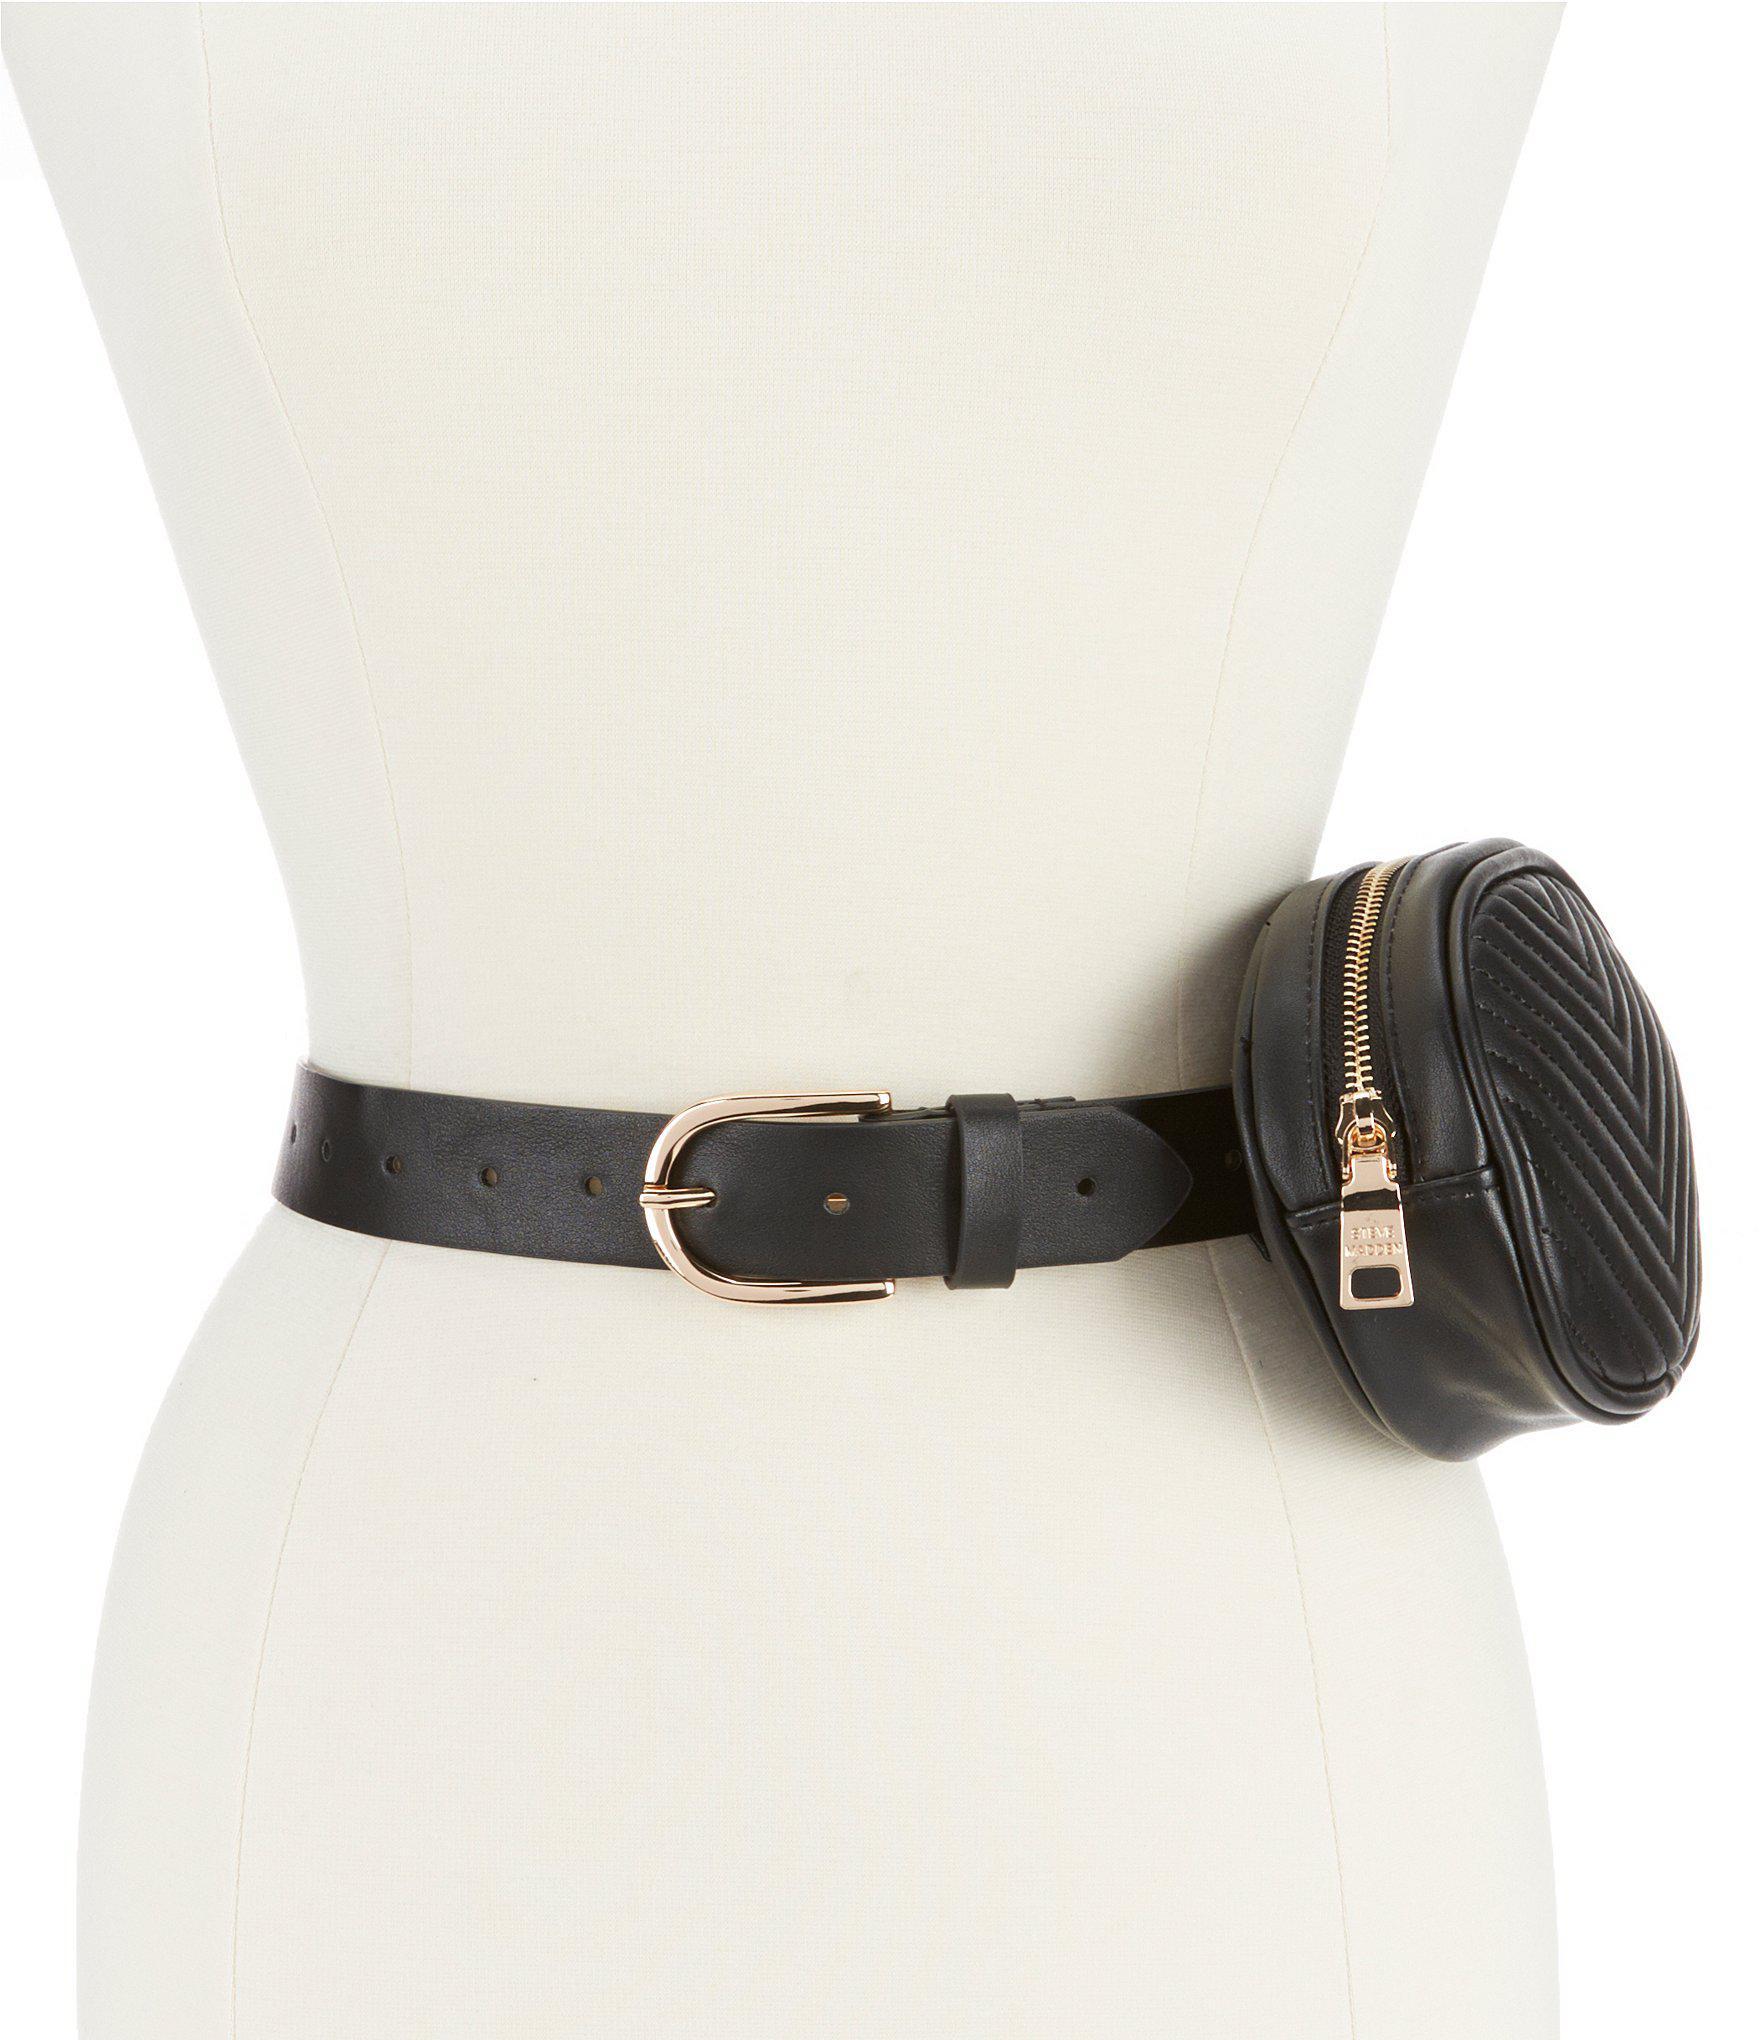 be717344d1cc Steve Madden Quilted Belt Bag in Black - Lyst